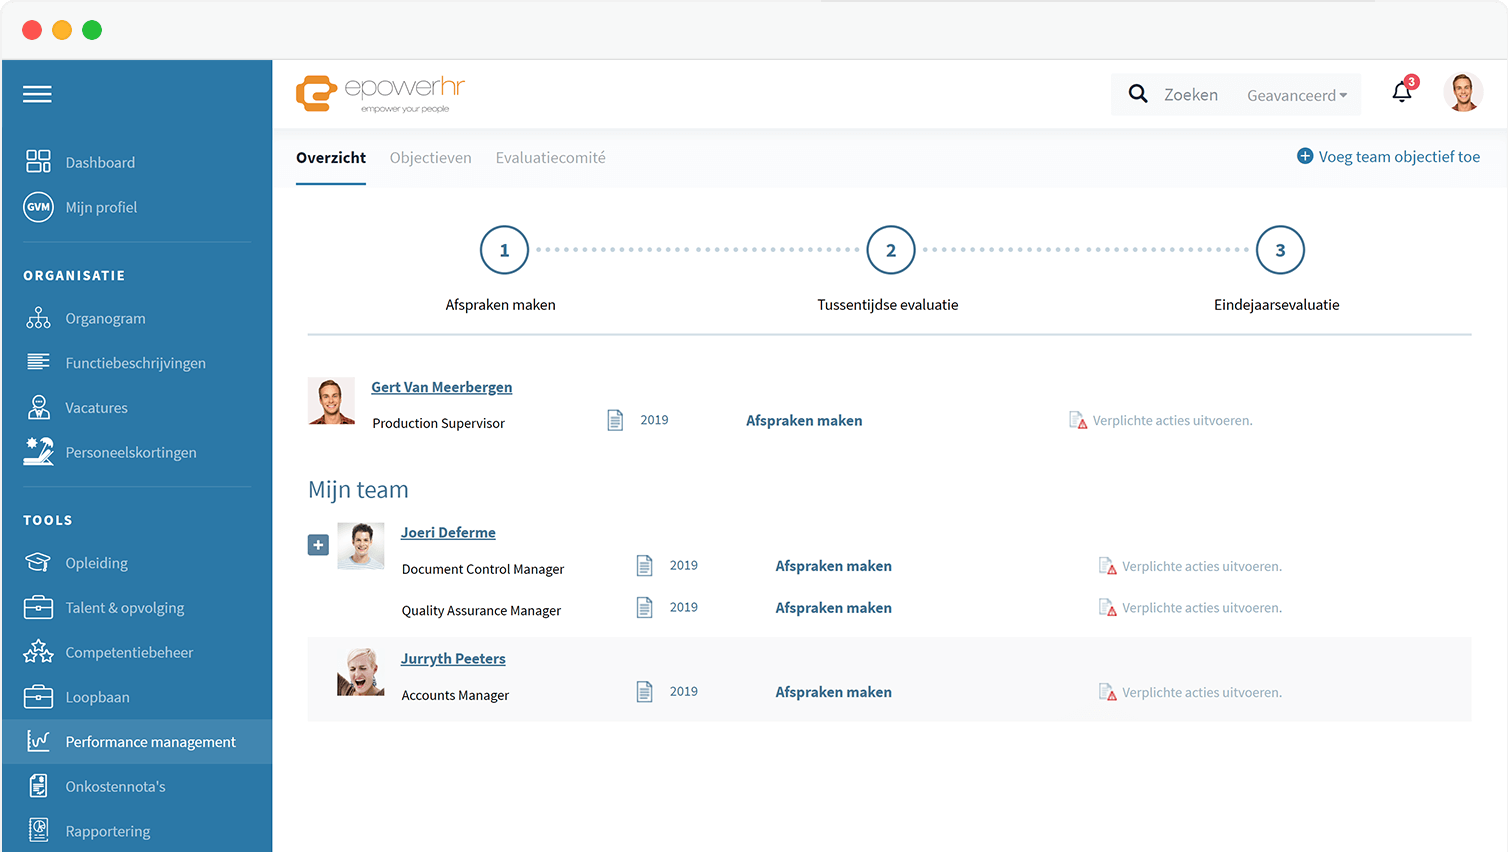 HR Software - Performance management